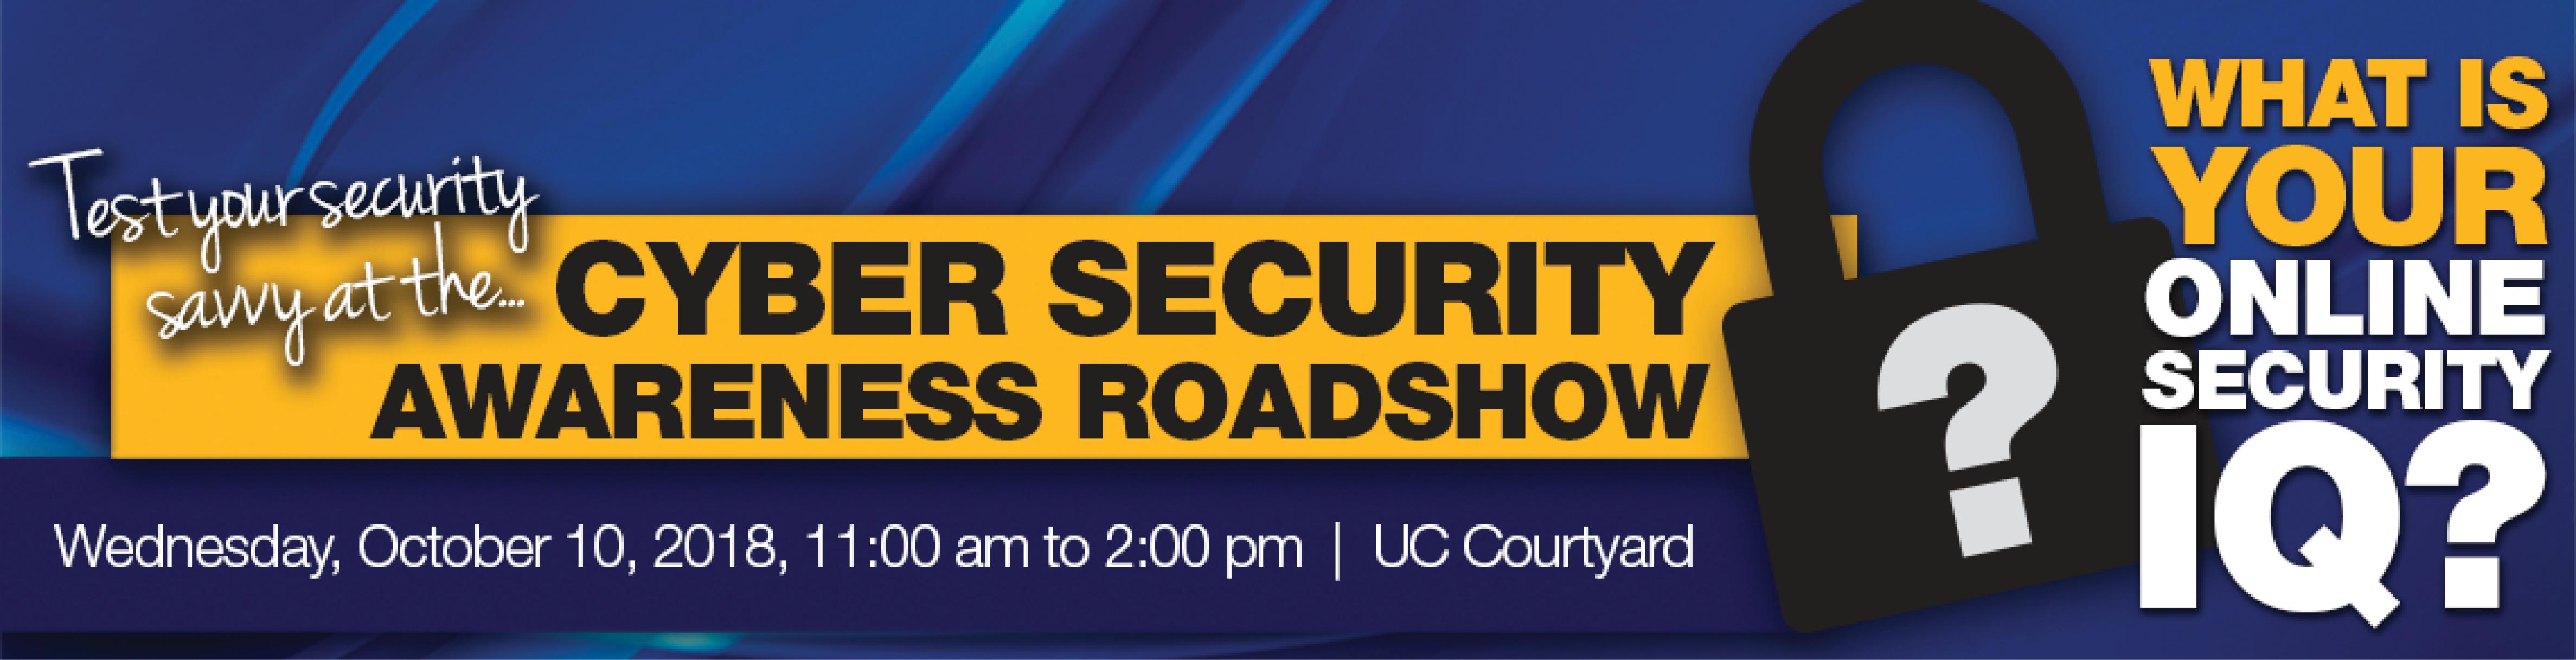 Security Awareness Roadshow Banner